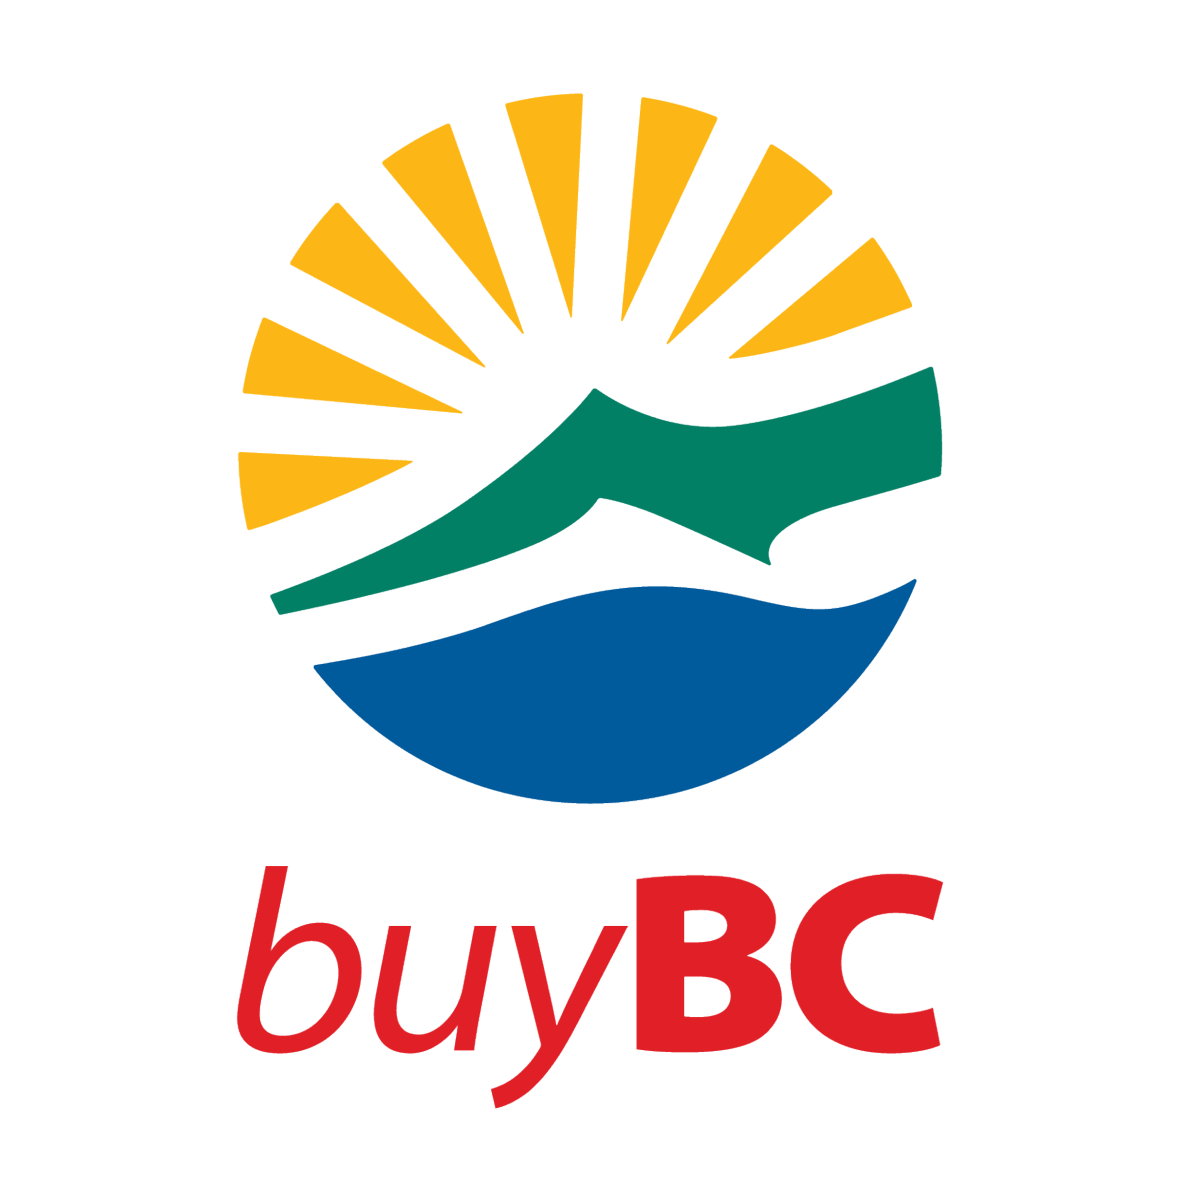 BuyBC.png